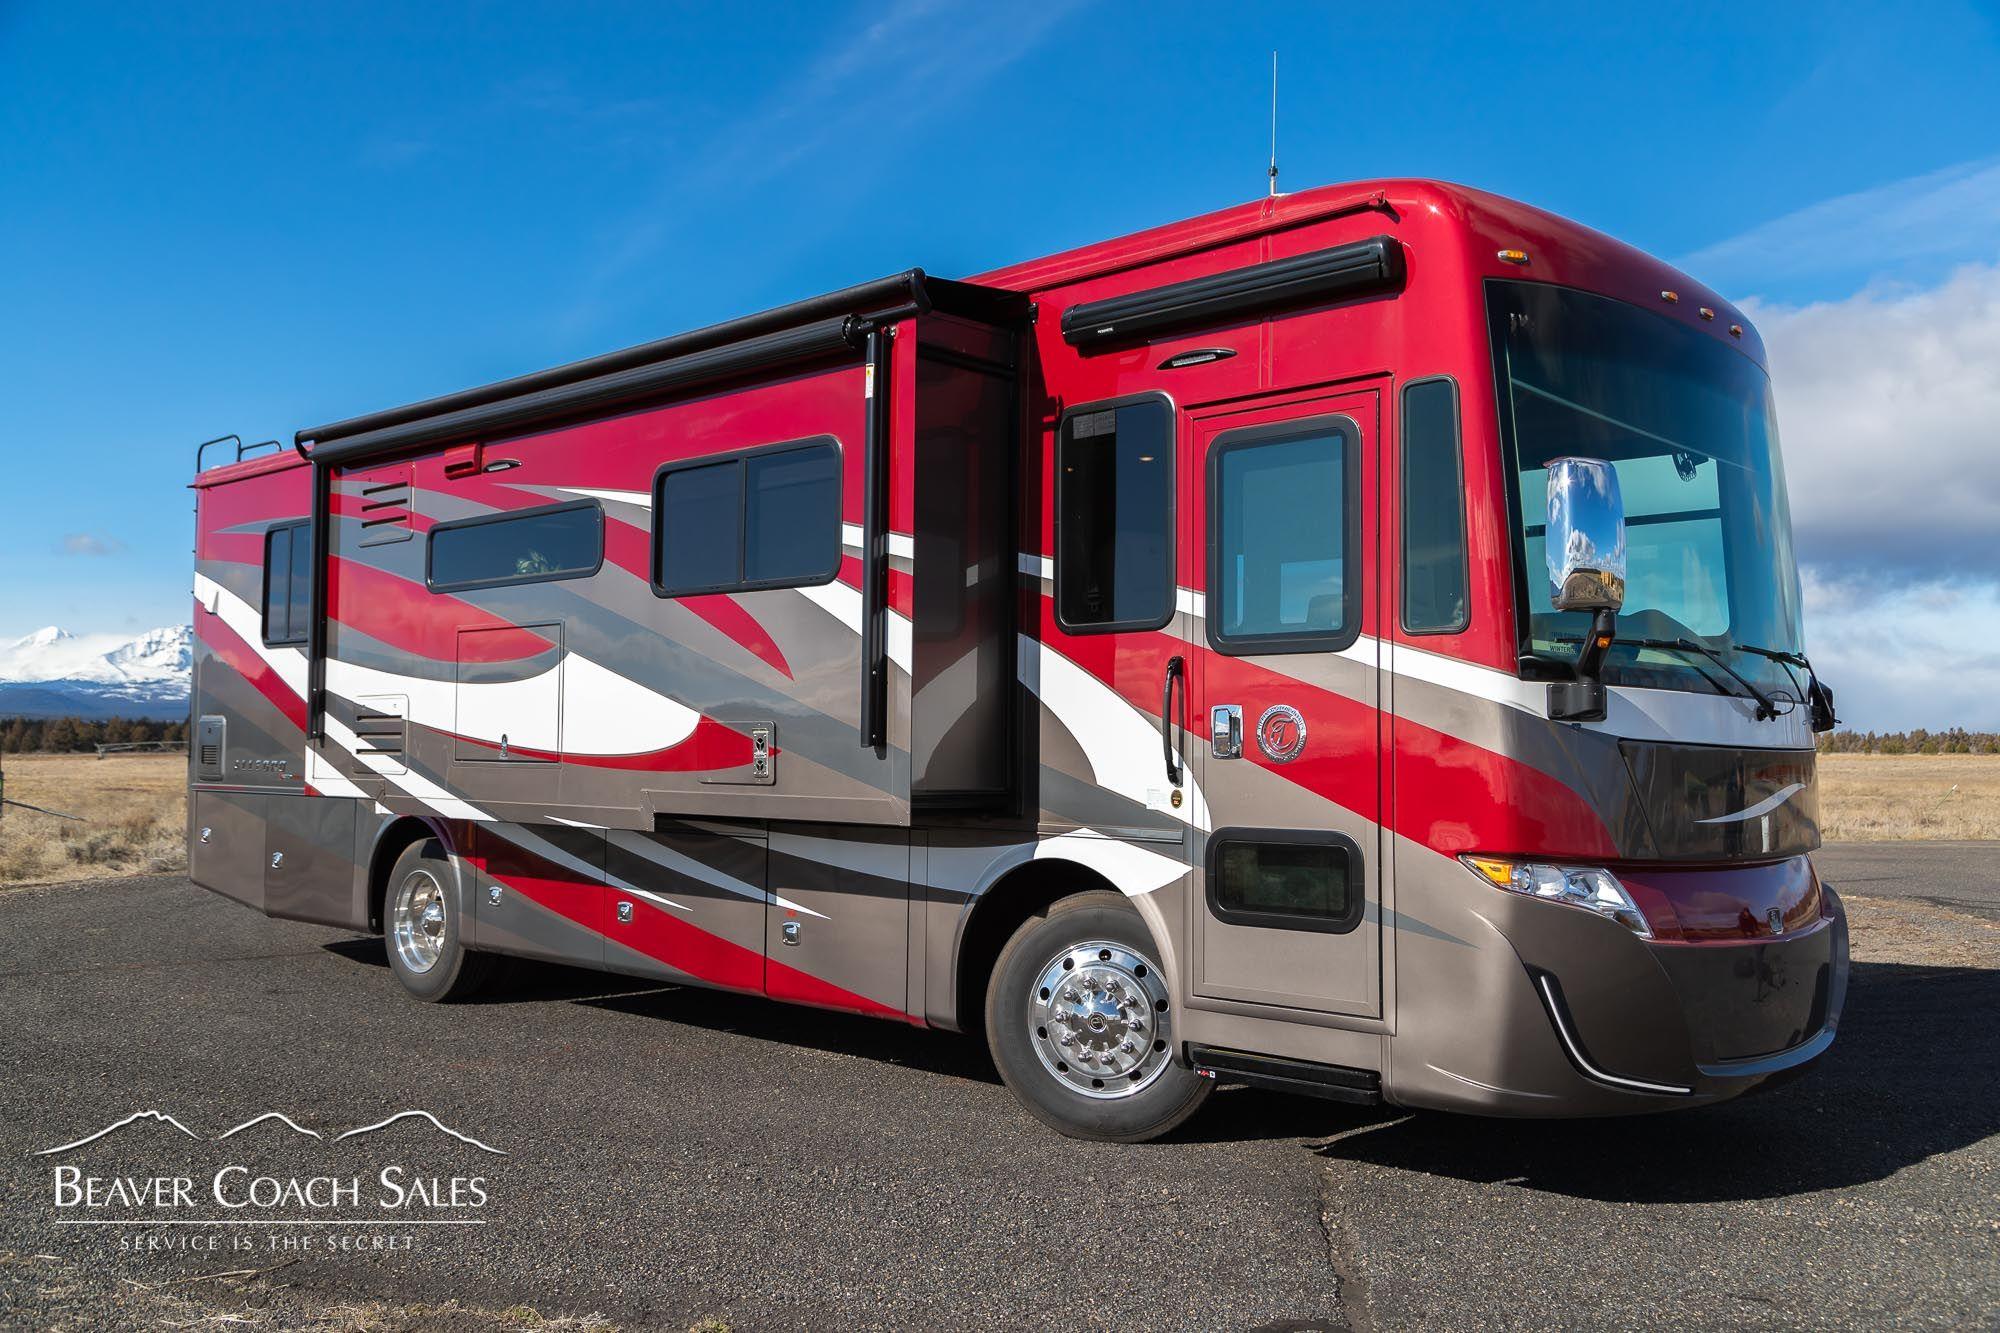 2020 Tiffin Motorhomes Allegro Red 340 33 Al New Stock In 2020